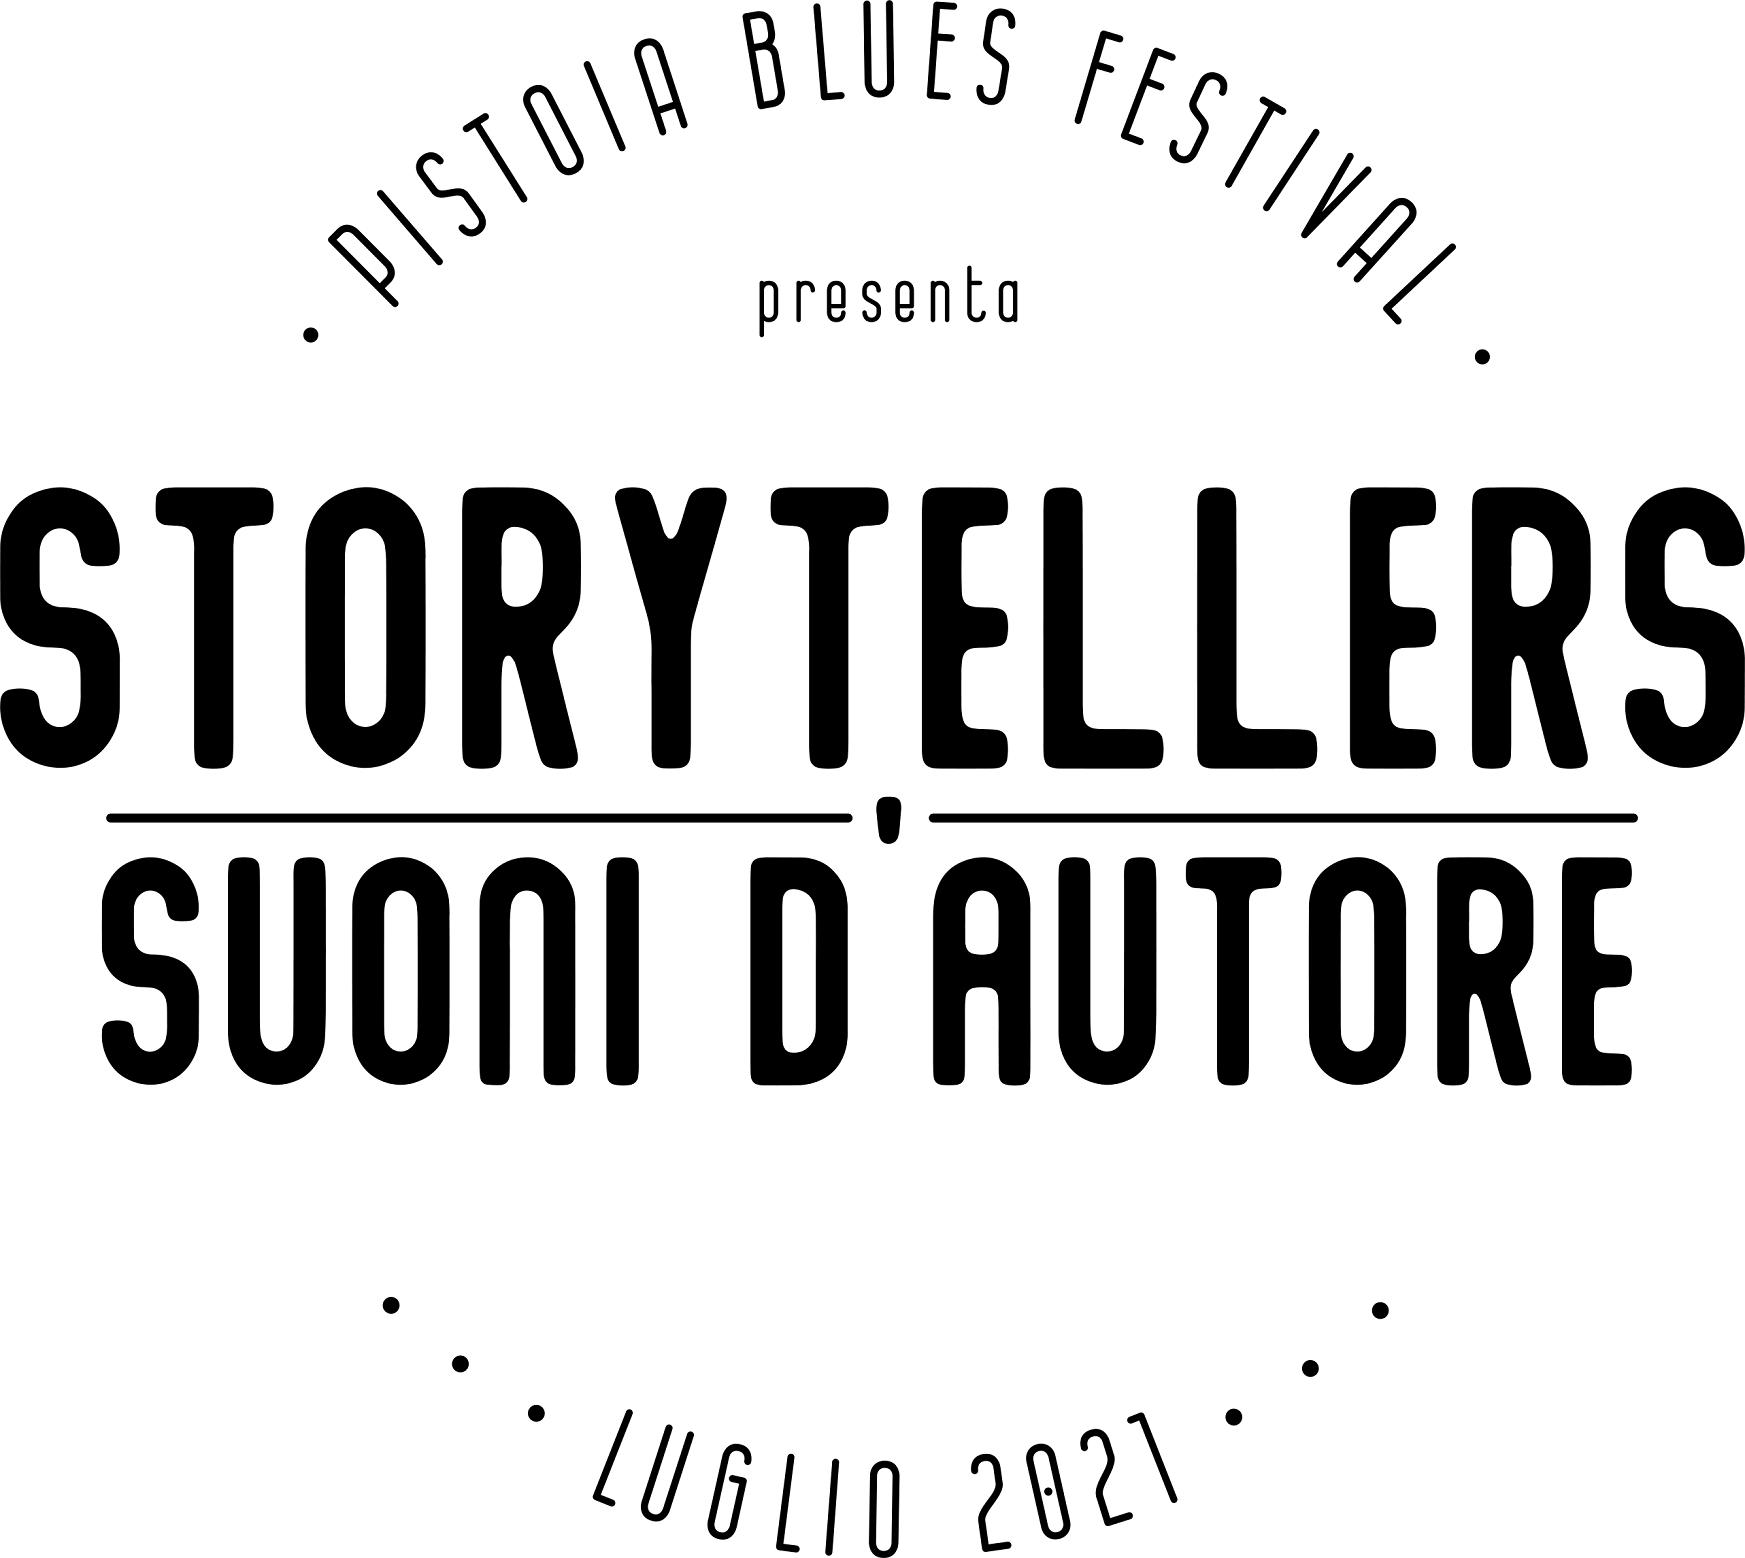 STORYTELLERS - Suoni d'Autore a Pistoia